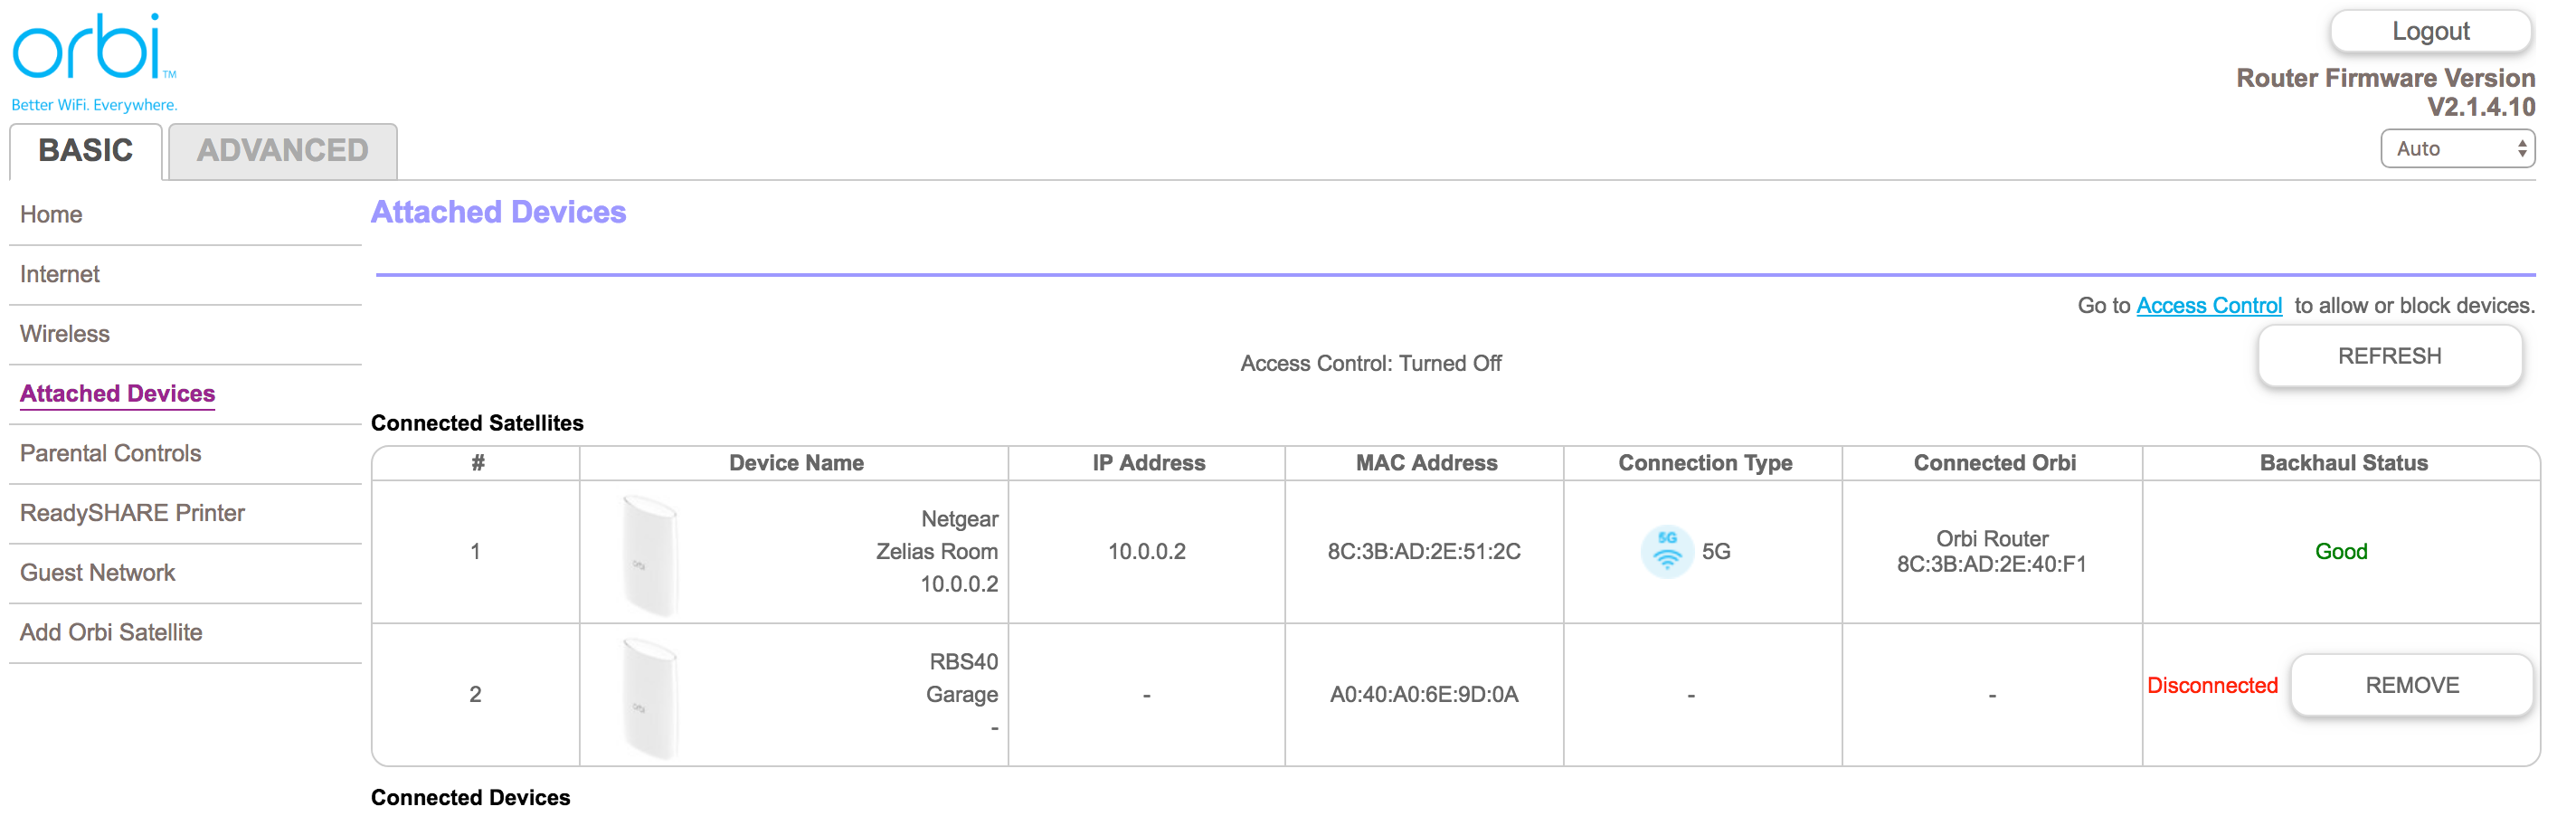 How do you set up an Orbi Satellite via Ethernet? - NETGEAR